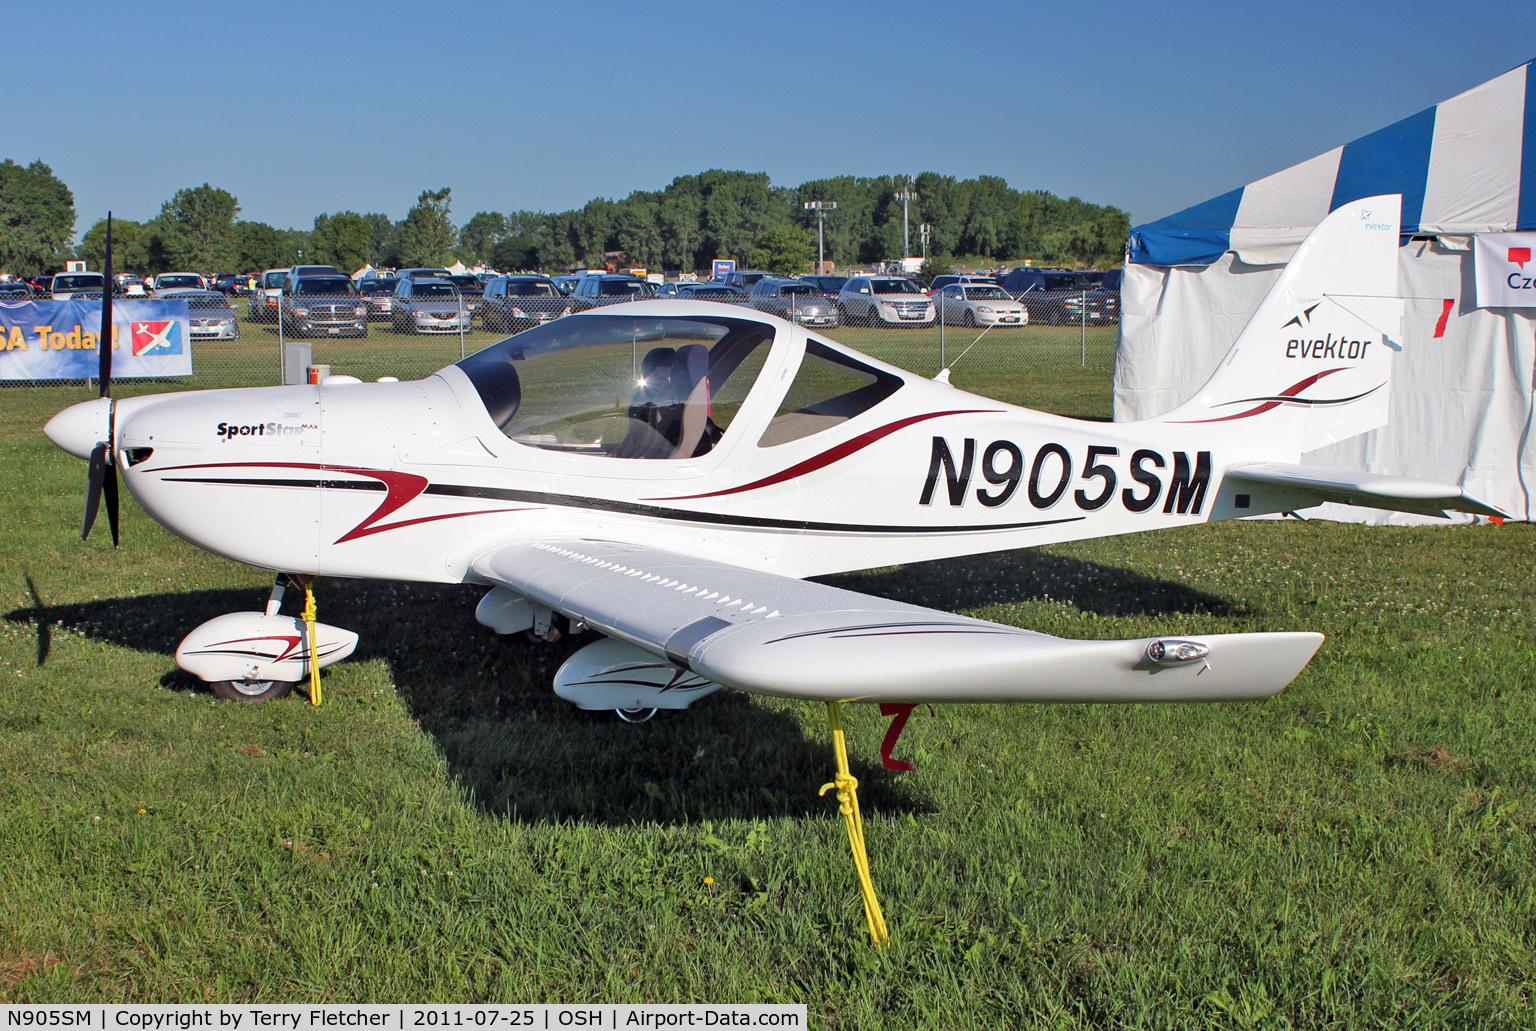 N905SM, Evektor-Aerotechnik Sportstar Max C/N 2010 1306, Evektor - Aerotechnik A S SPORTSTAR MAX, c/n: 2010 1306 displayed in the 2011 Oshkosh Static Park